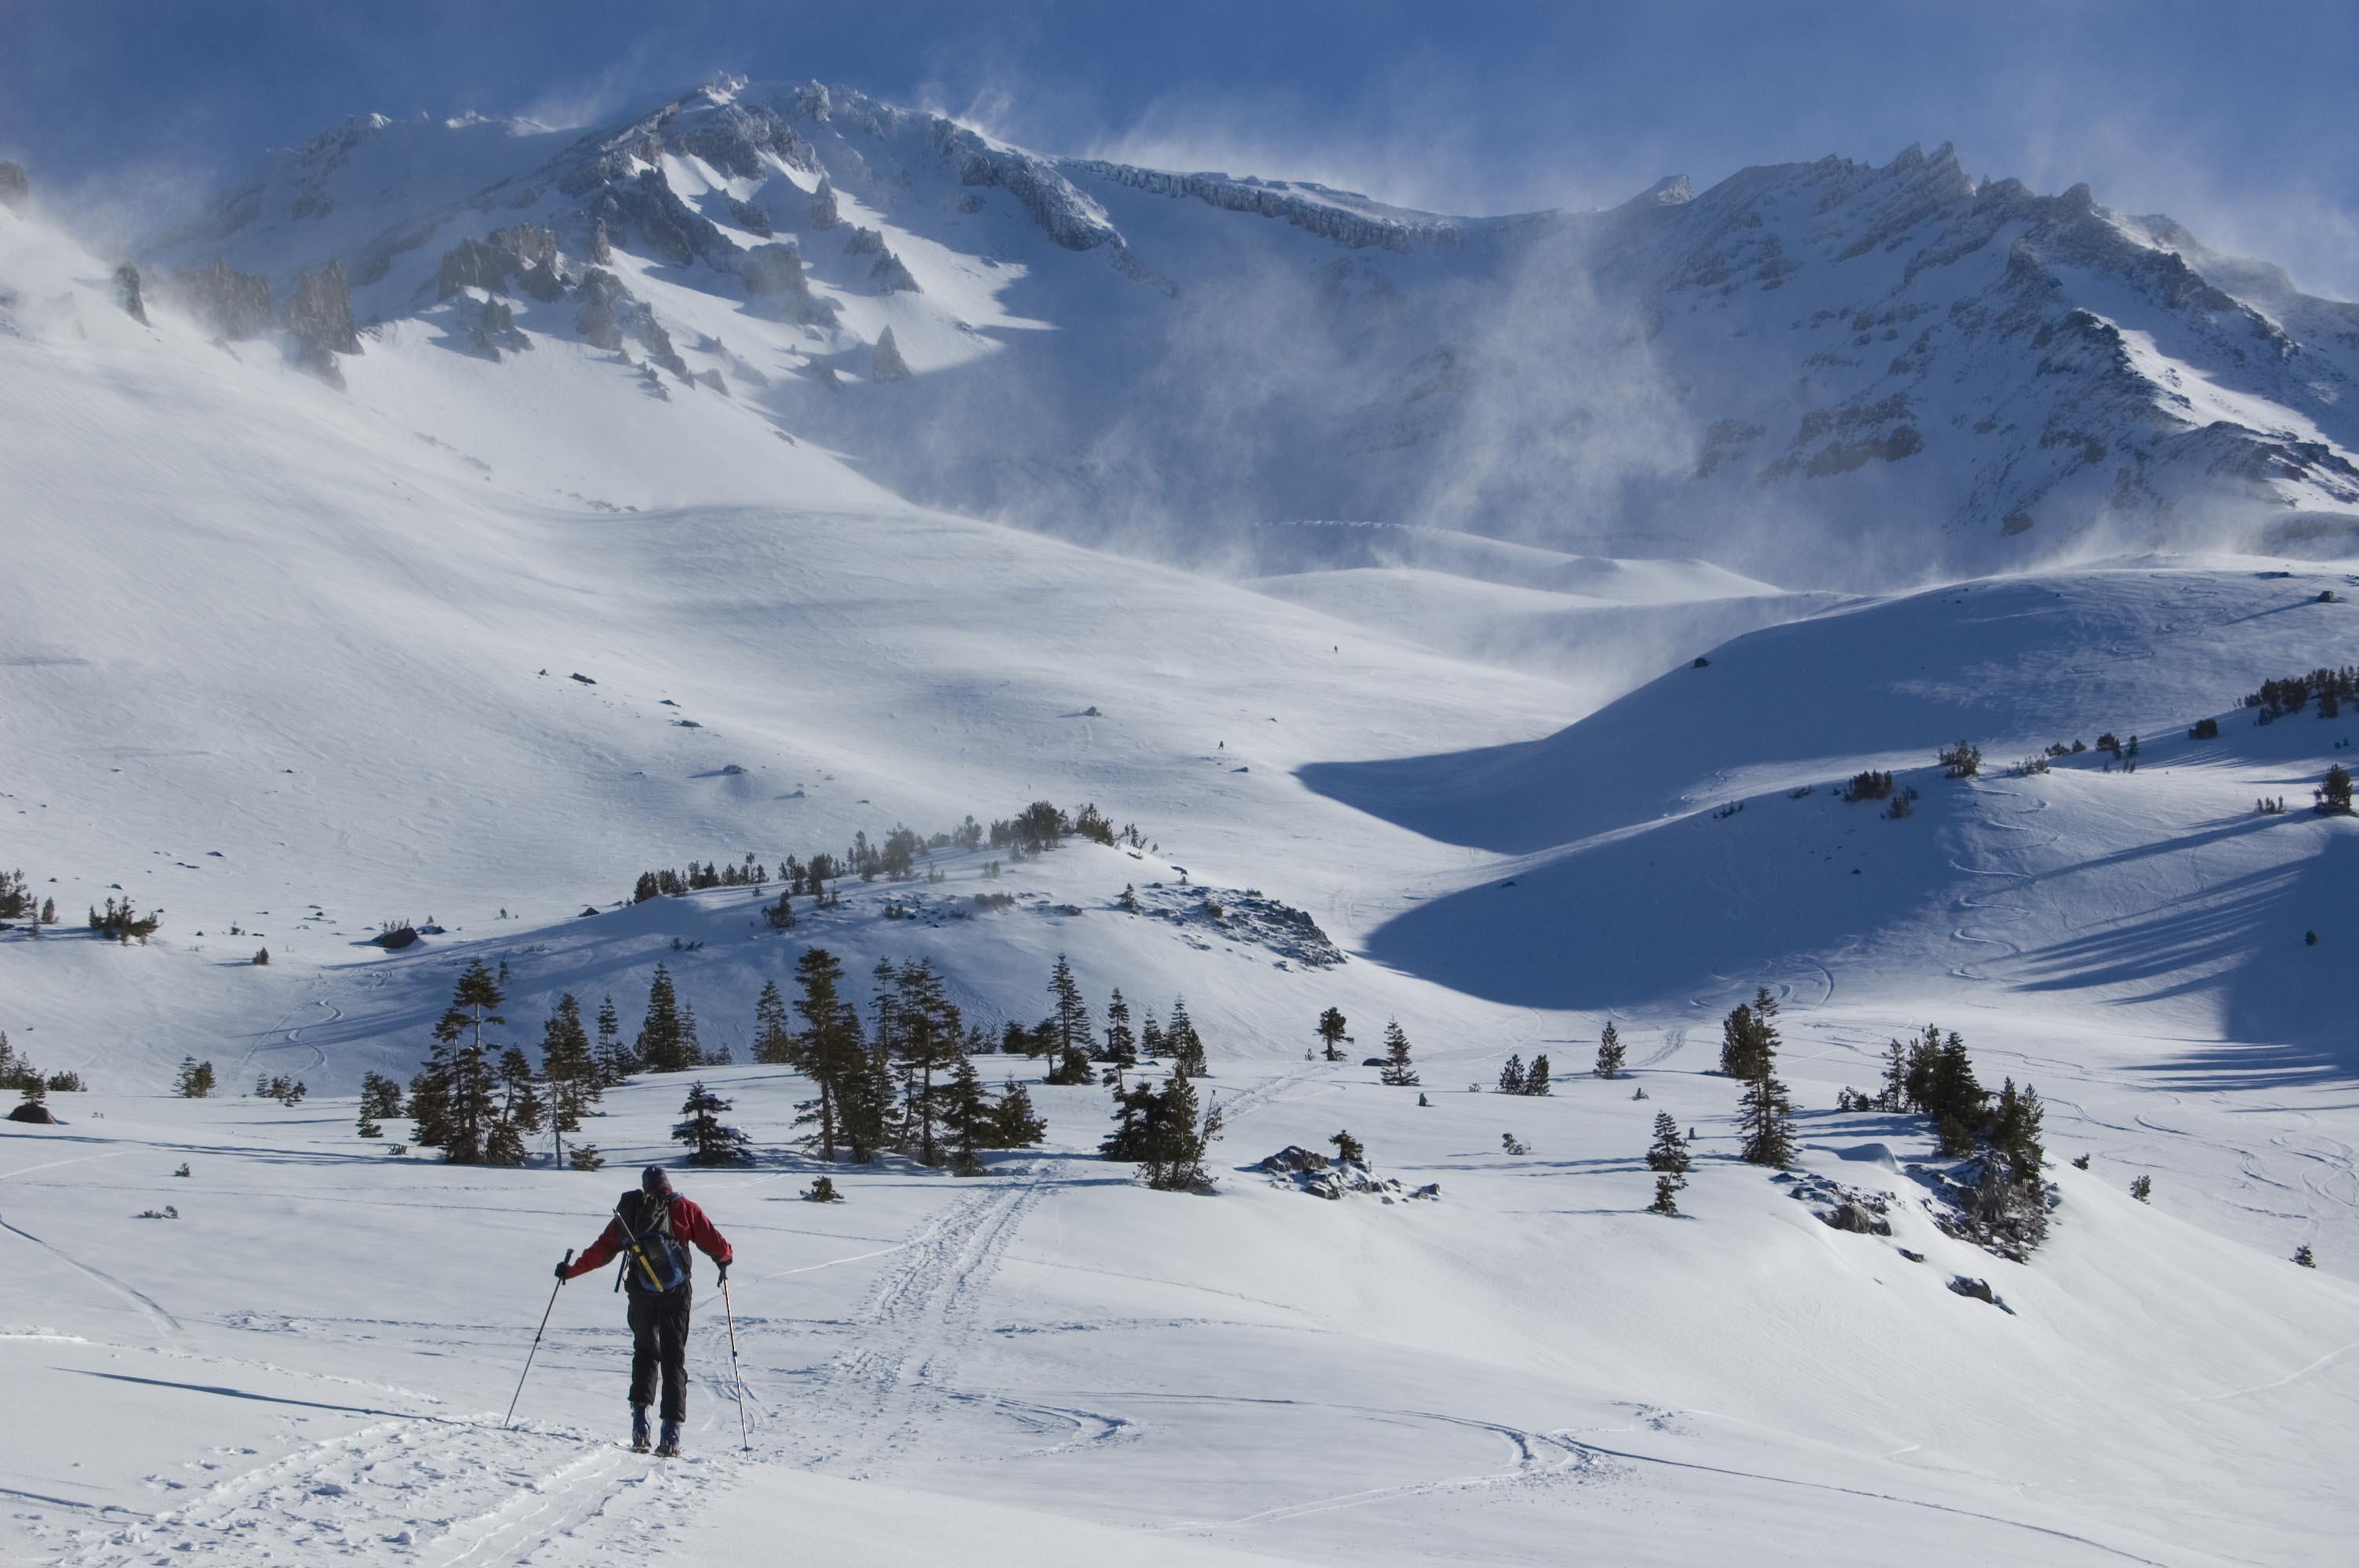 backcountry skiing sierra club